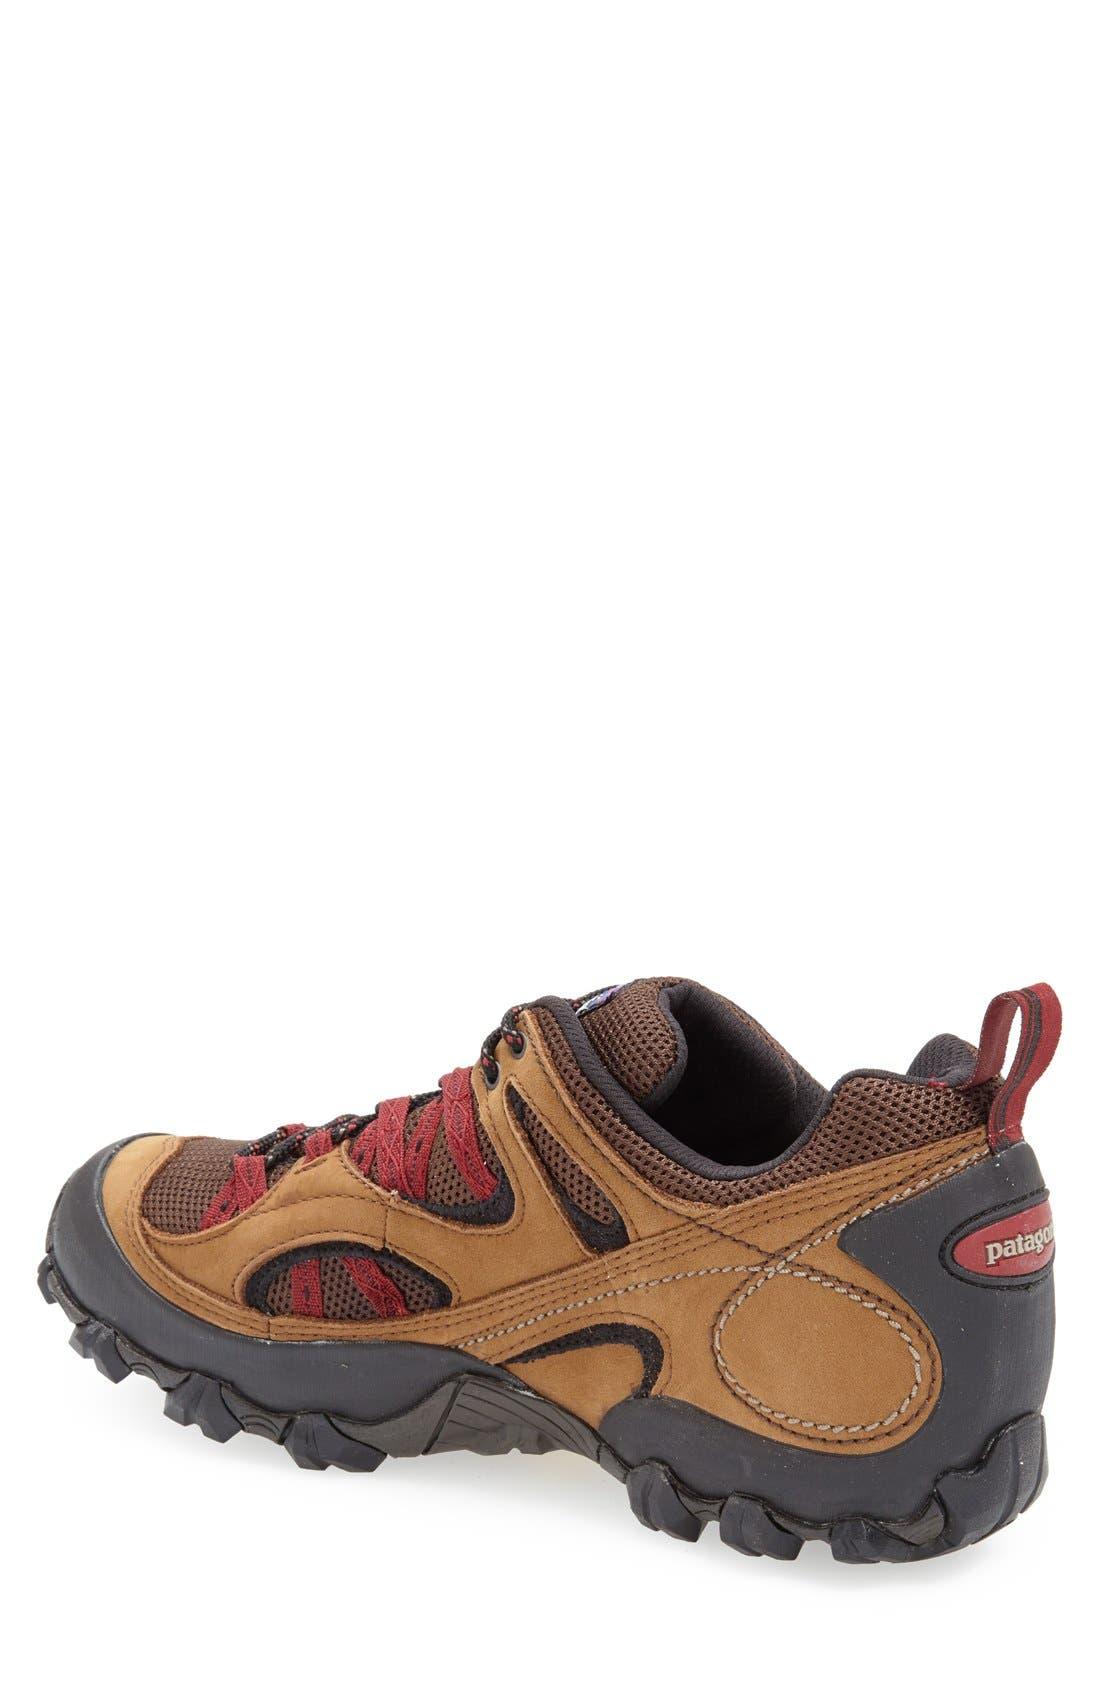 Alternate Image 2  - Patagonia 'Drifter A/C' Trail Shoe (Men)